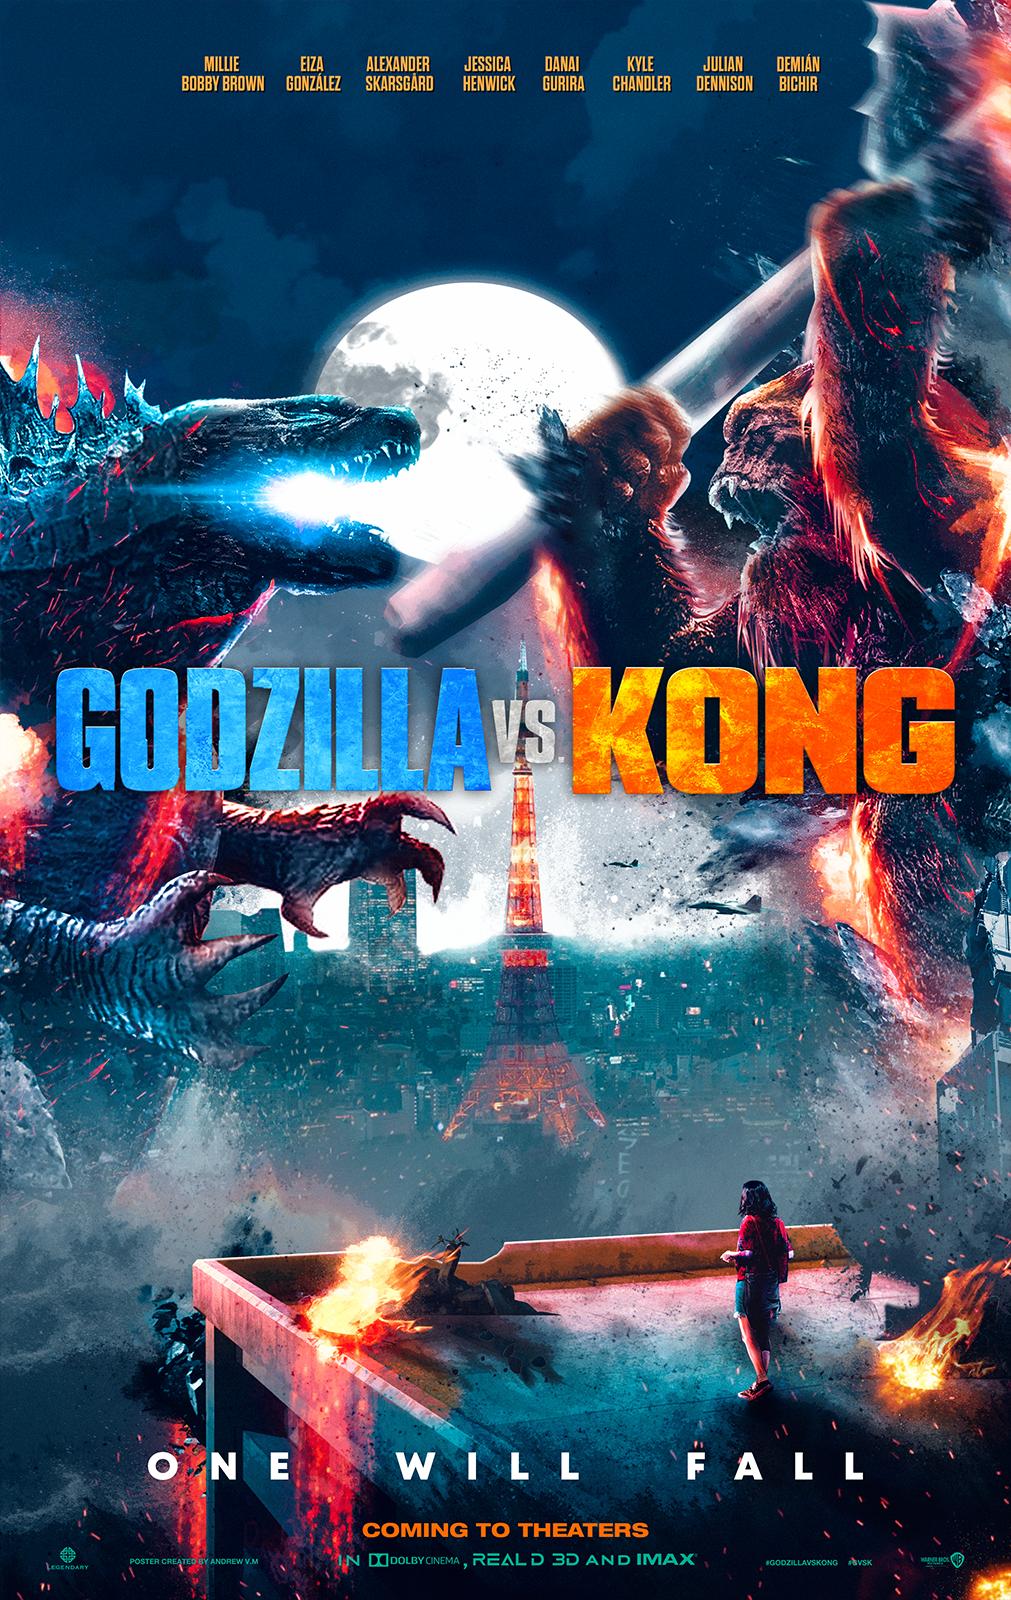 Godzilla Vs Kong Poster Faight Hd By Andrewvm On Deviantart